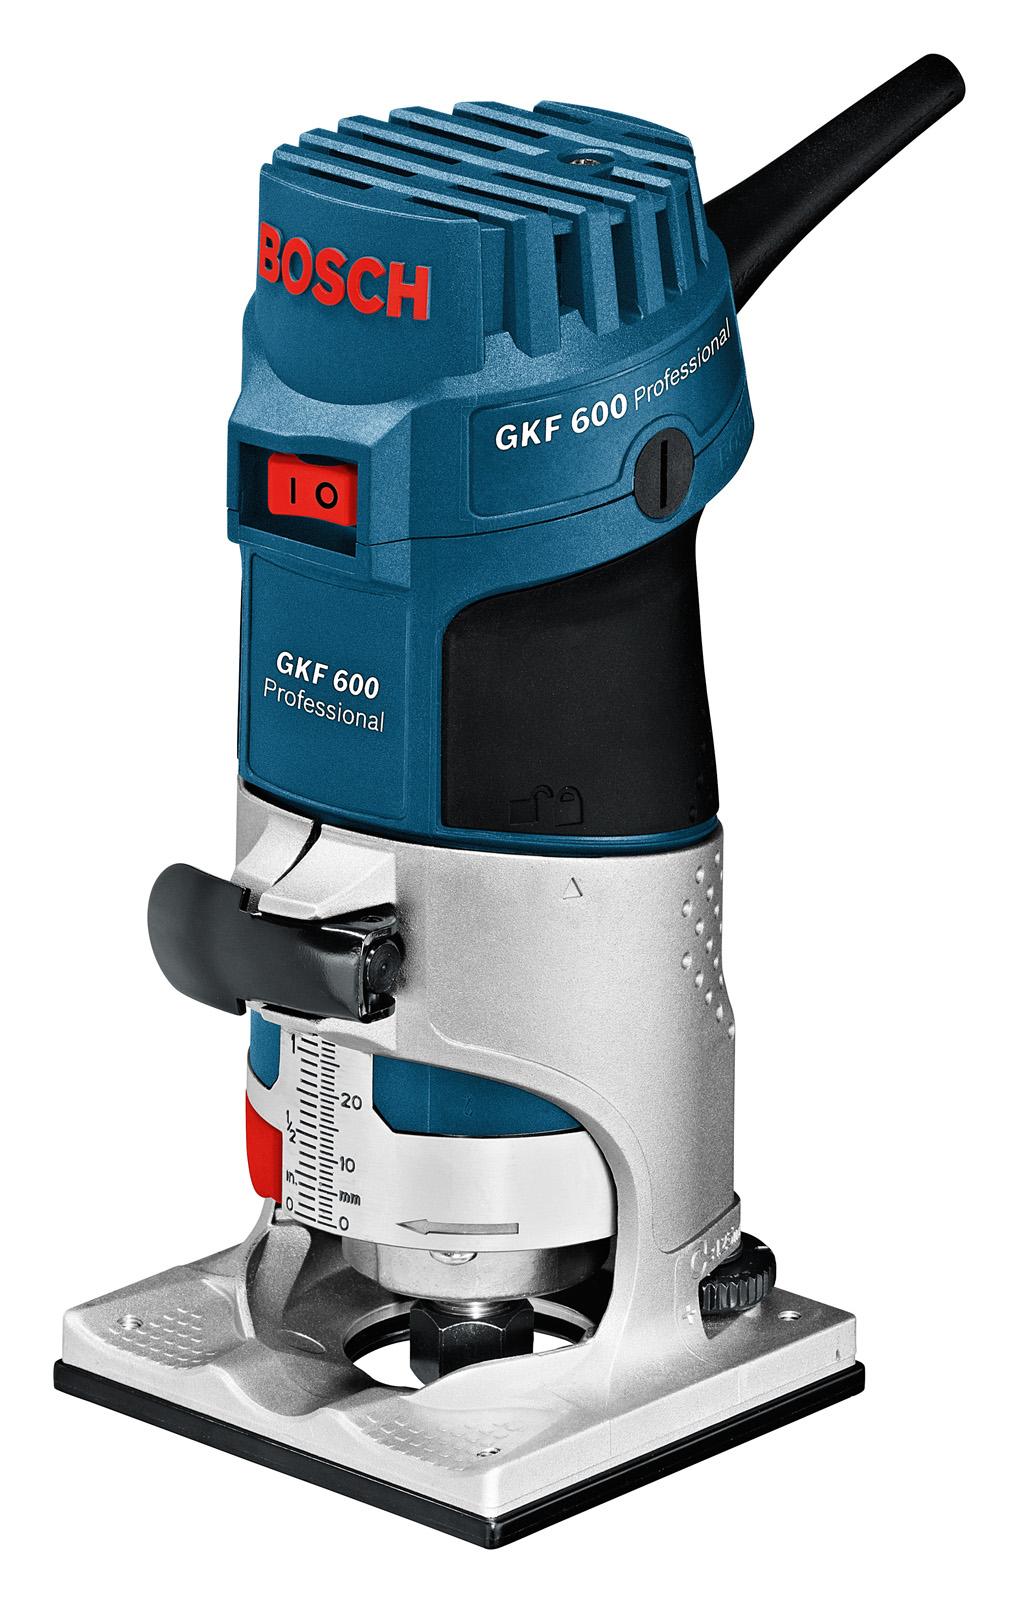 ��������� ������ Bosch Gkf 600 l-boxx